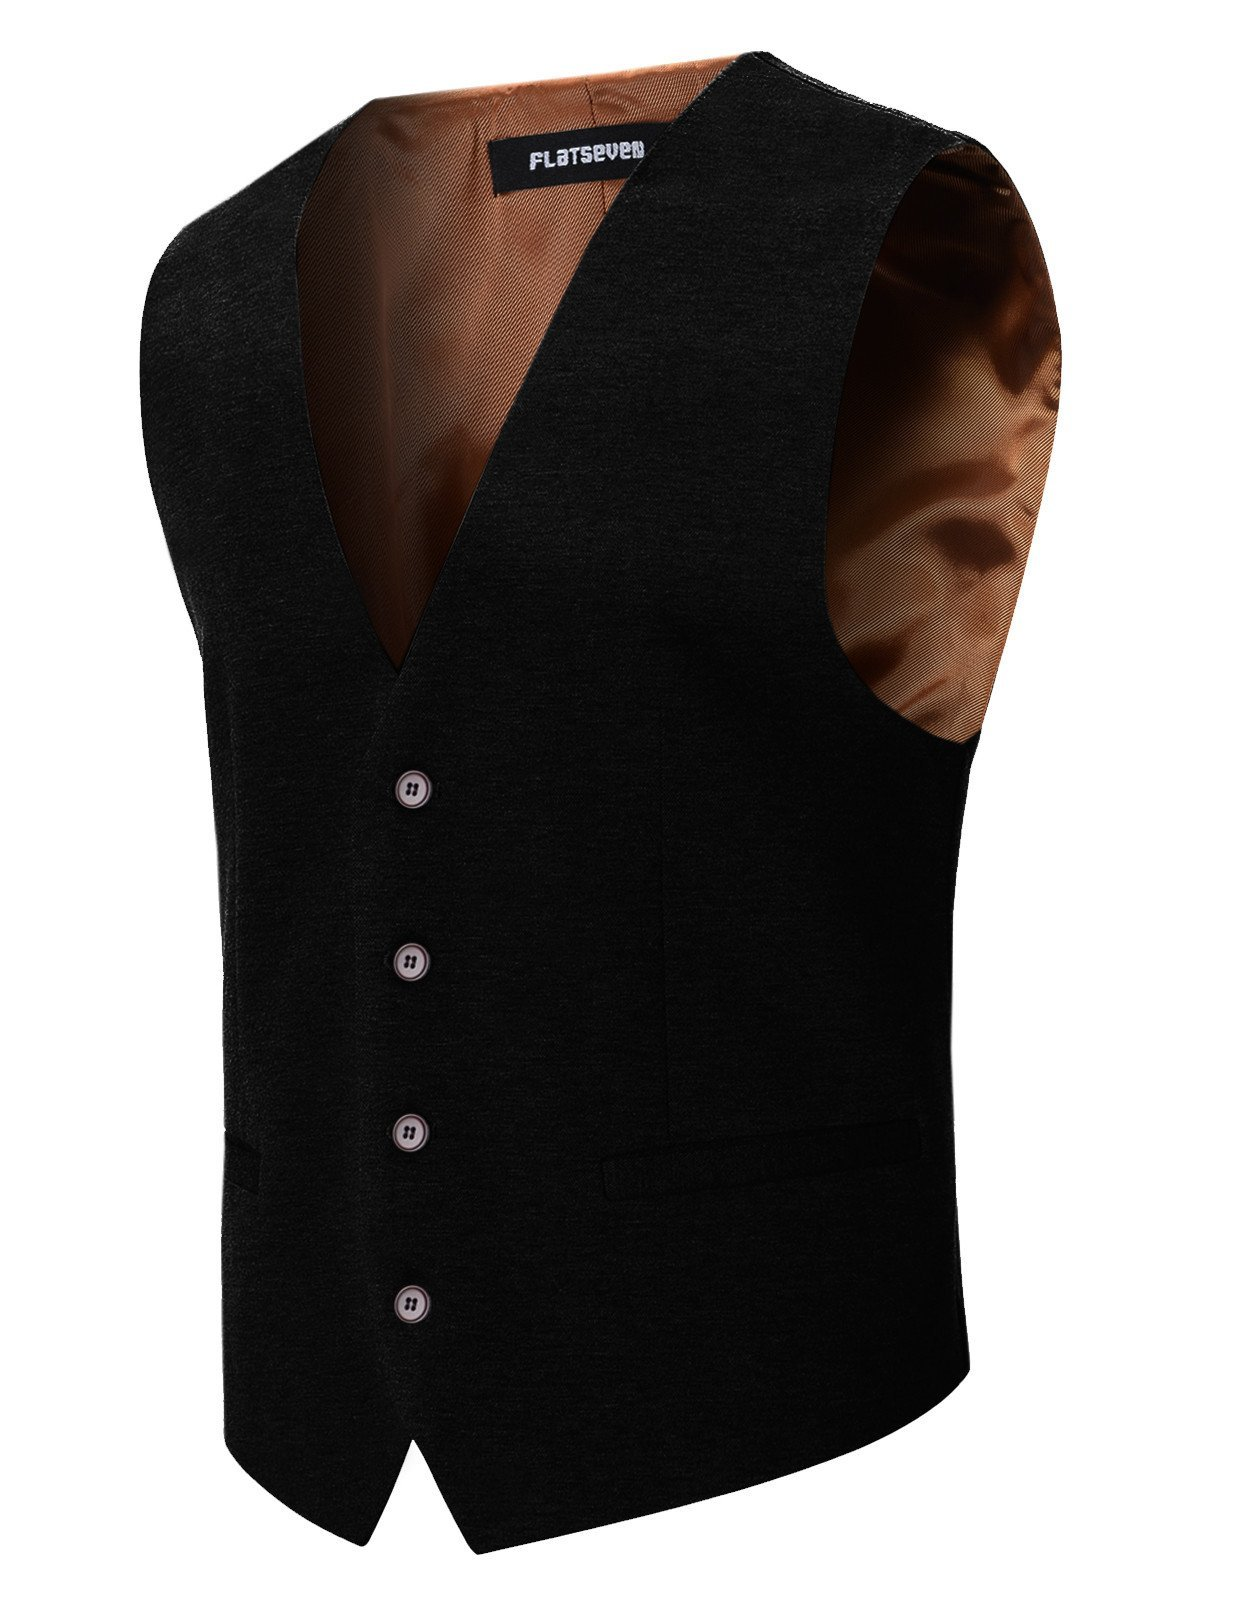 FLATSEVEN Mens Designer Stylish Casual Vest Premium (VE701) Black, XXL